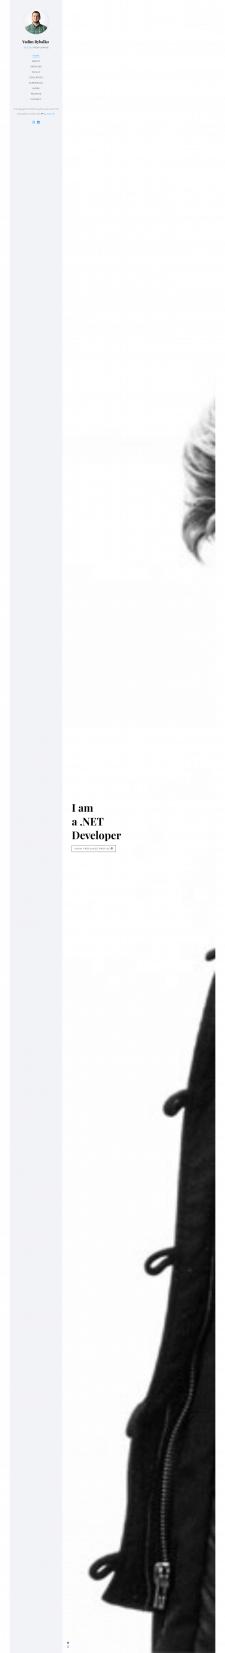 Портфолио .NET разработчика